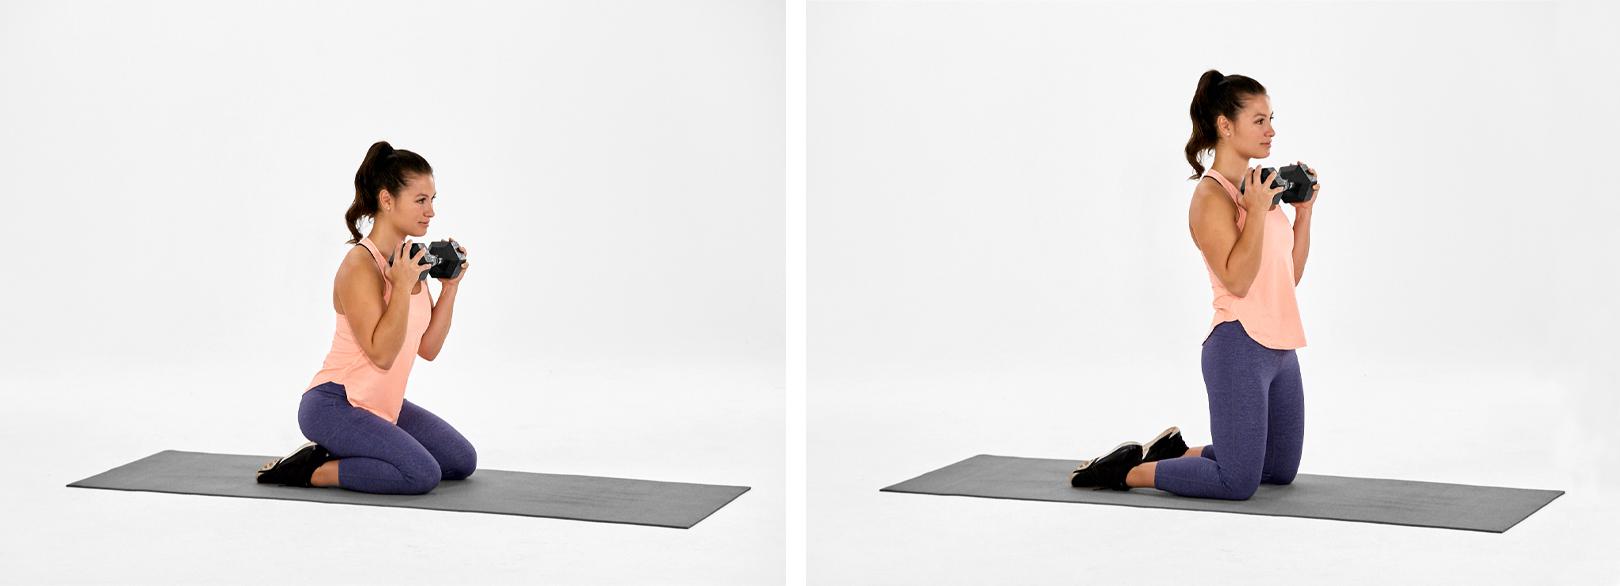 Camel - Lower Body Exercises